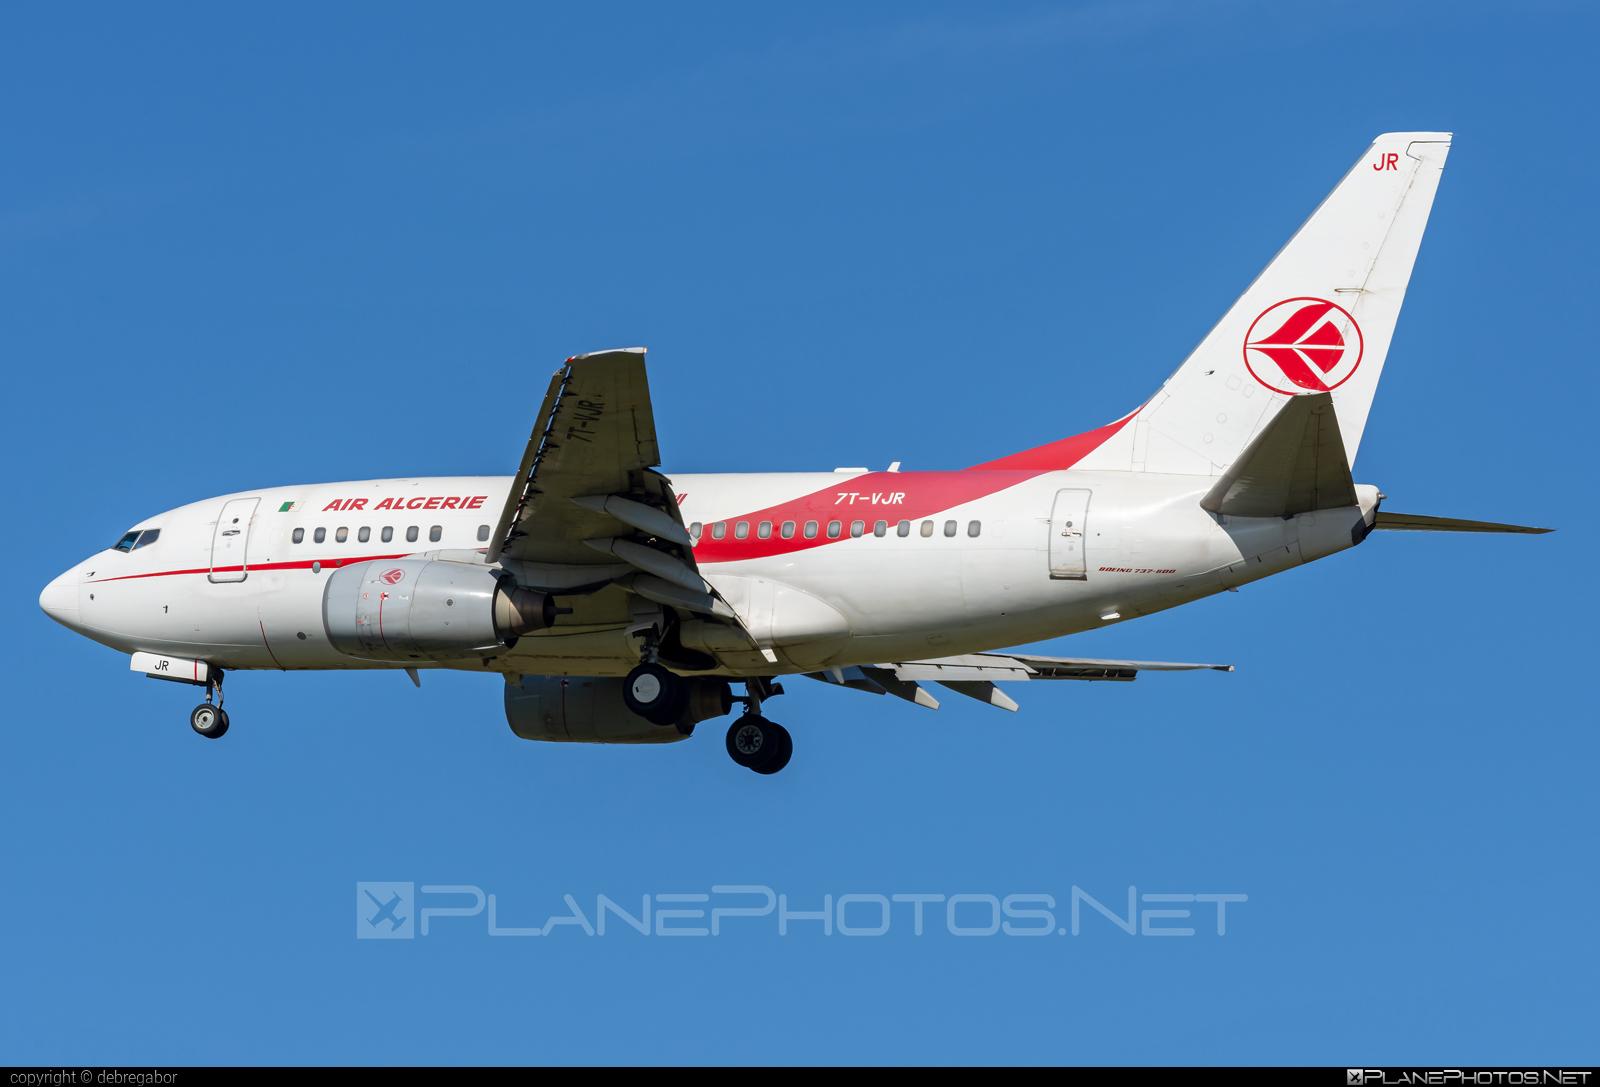 Boeing 737-600 - 7T-VJR operated by Air Algerie #b737 #b737nextgen #b737ng #boeing #boeing737